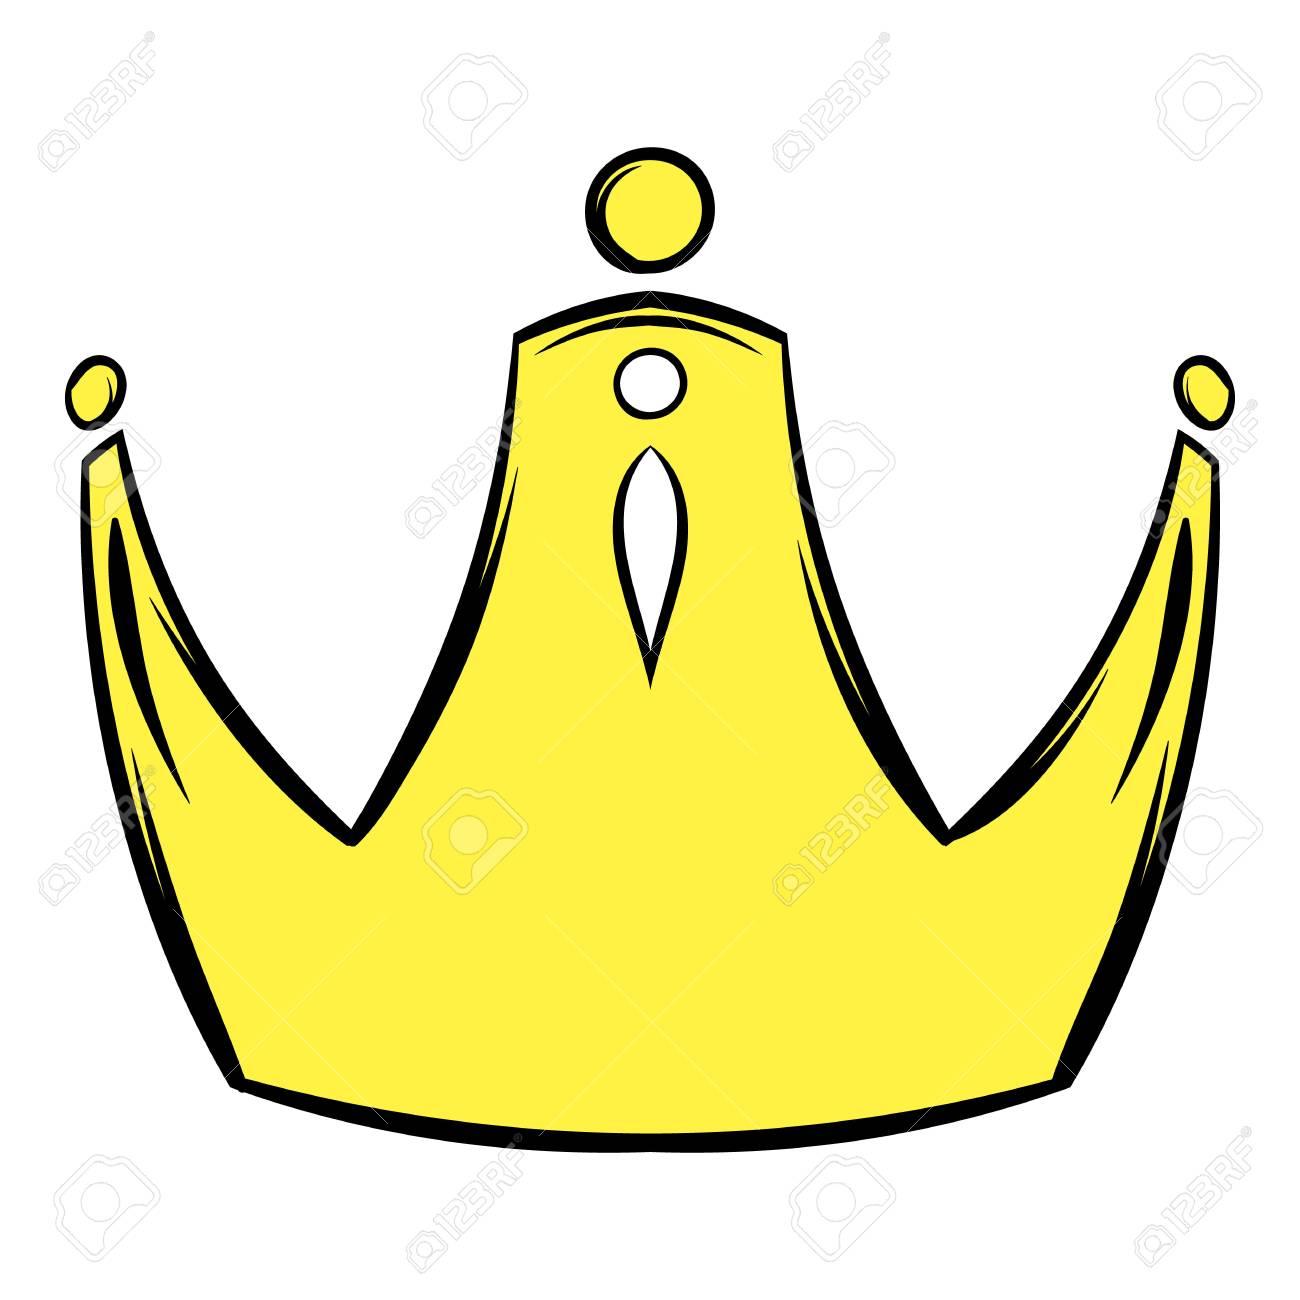 Golden Crown Icon Cartoon Royalty Free Cliparts Vectors And Stock Illustration Image 73501776 1000 x 780 jpeg 82 кб. 123rf com